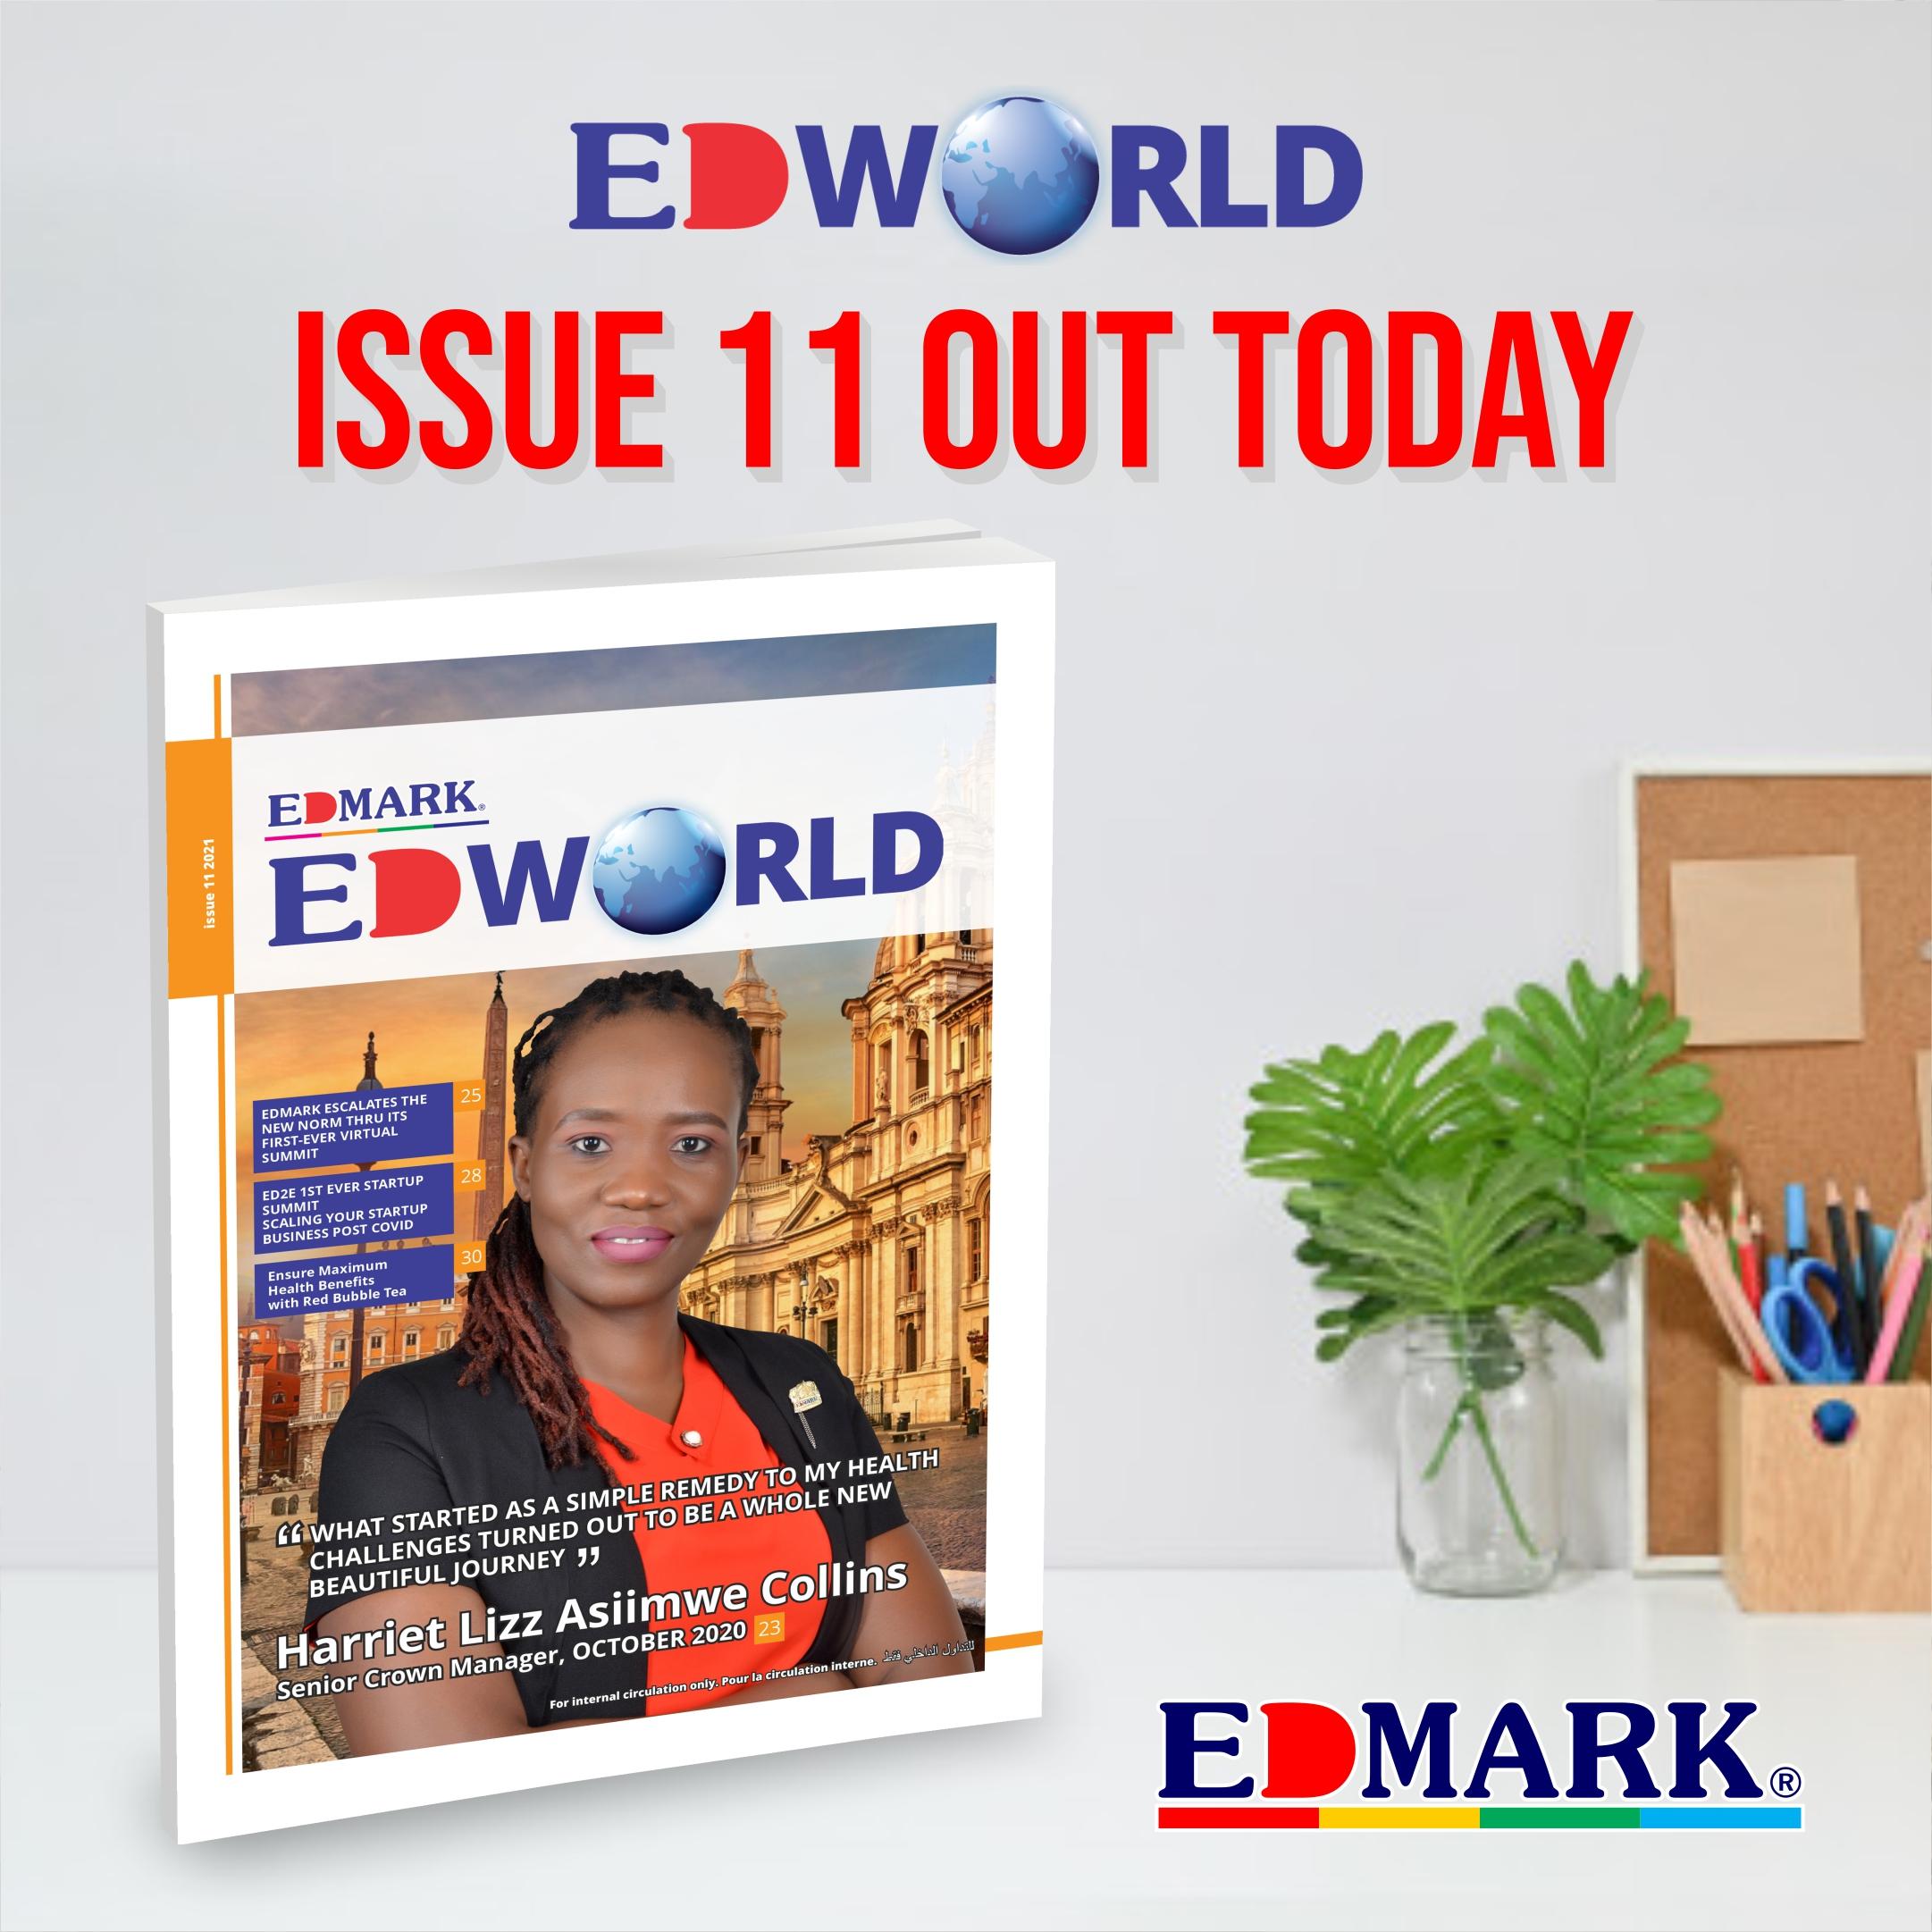 EDWORLD Issue 11